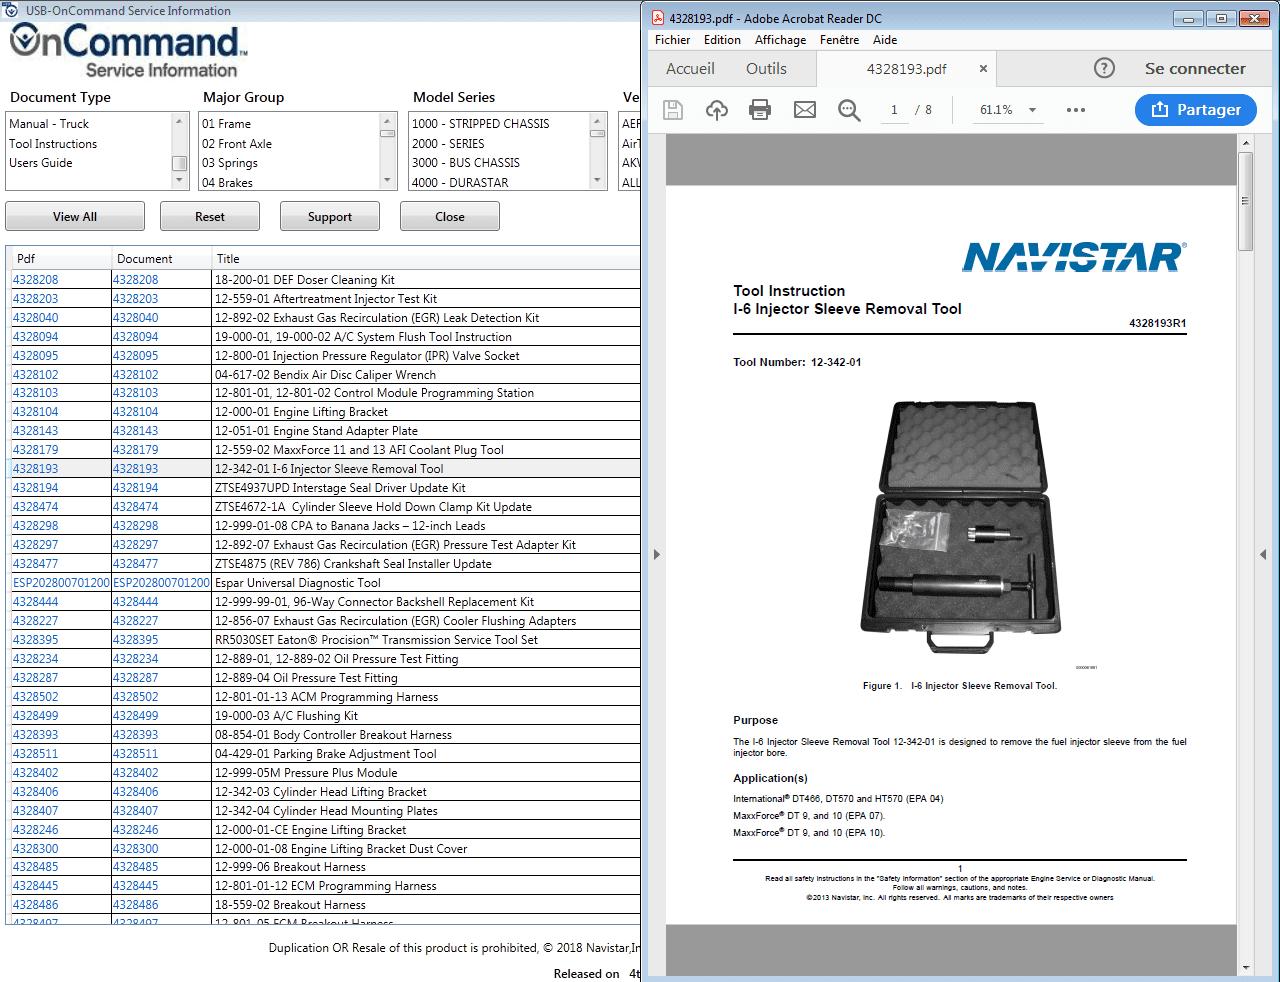 NAVISTAR_OnCommand_Service_Information_9